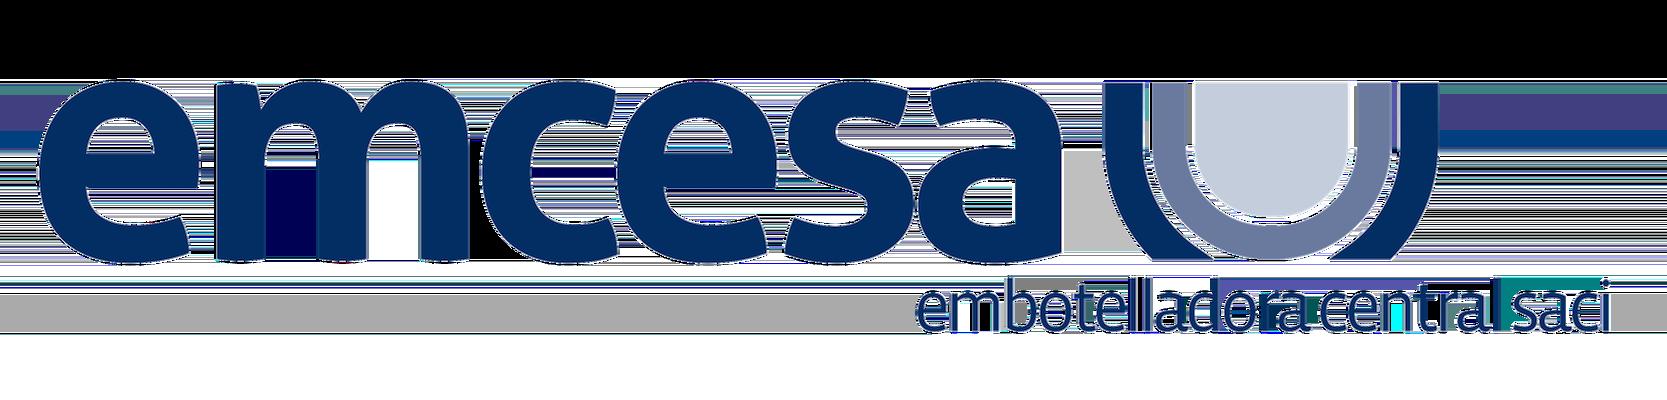 Embotelladora Central S.A.C.I. (EMCESA)